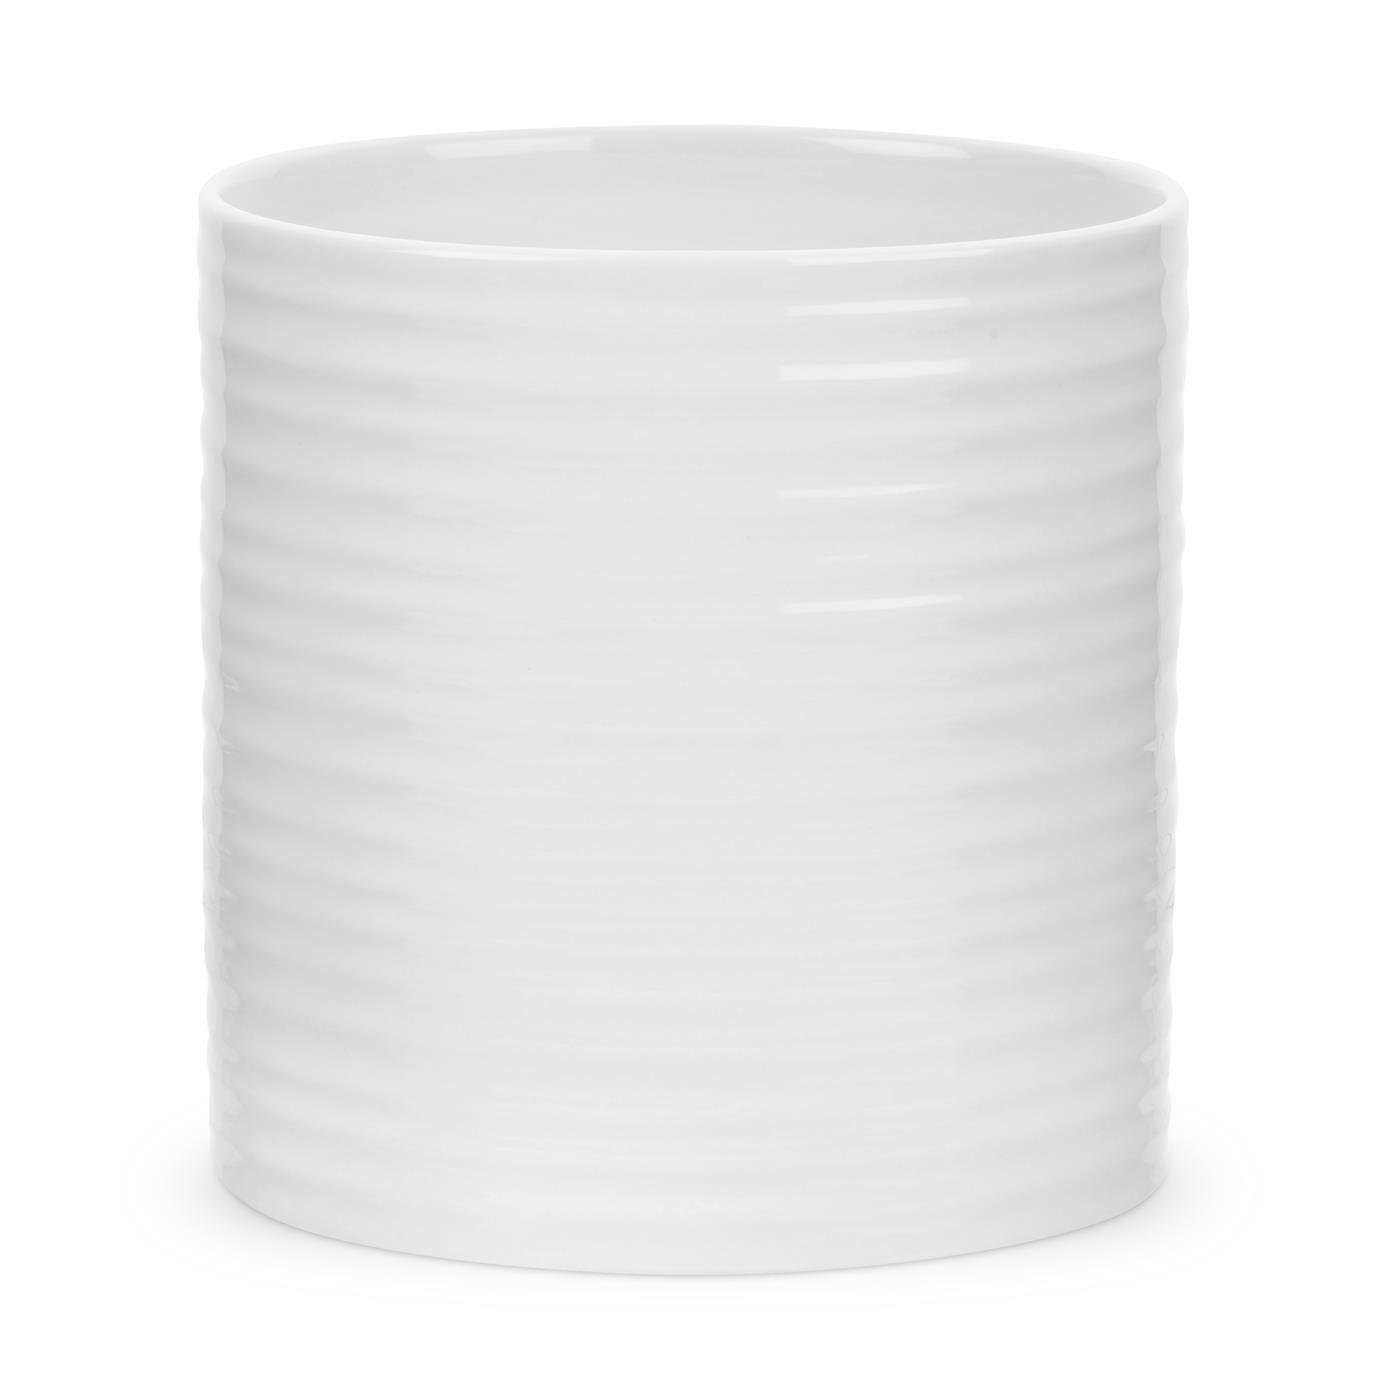 Portmeirion Sophie Conran White Oval Utensil Jar Portmeirion USA 749151570580